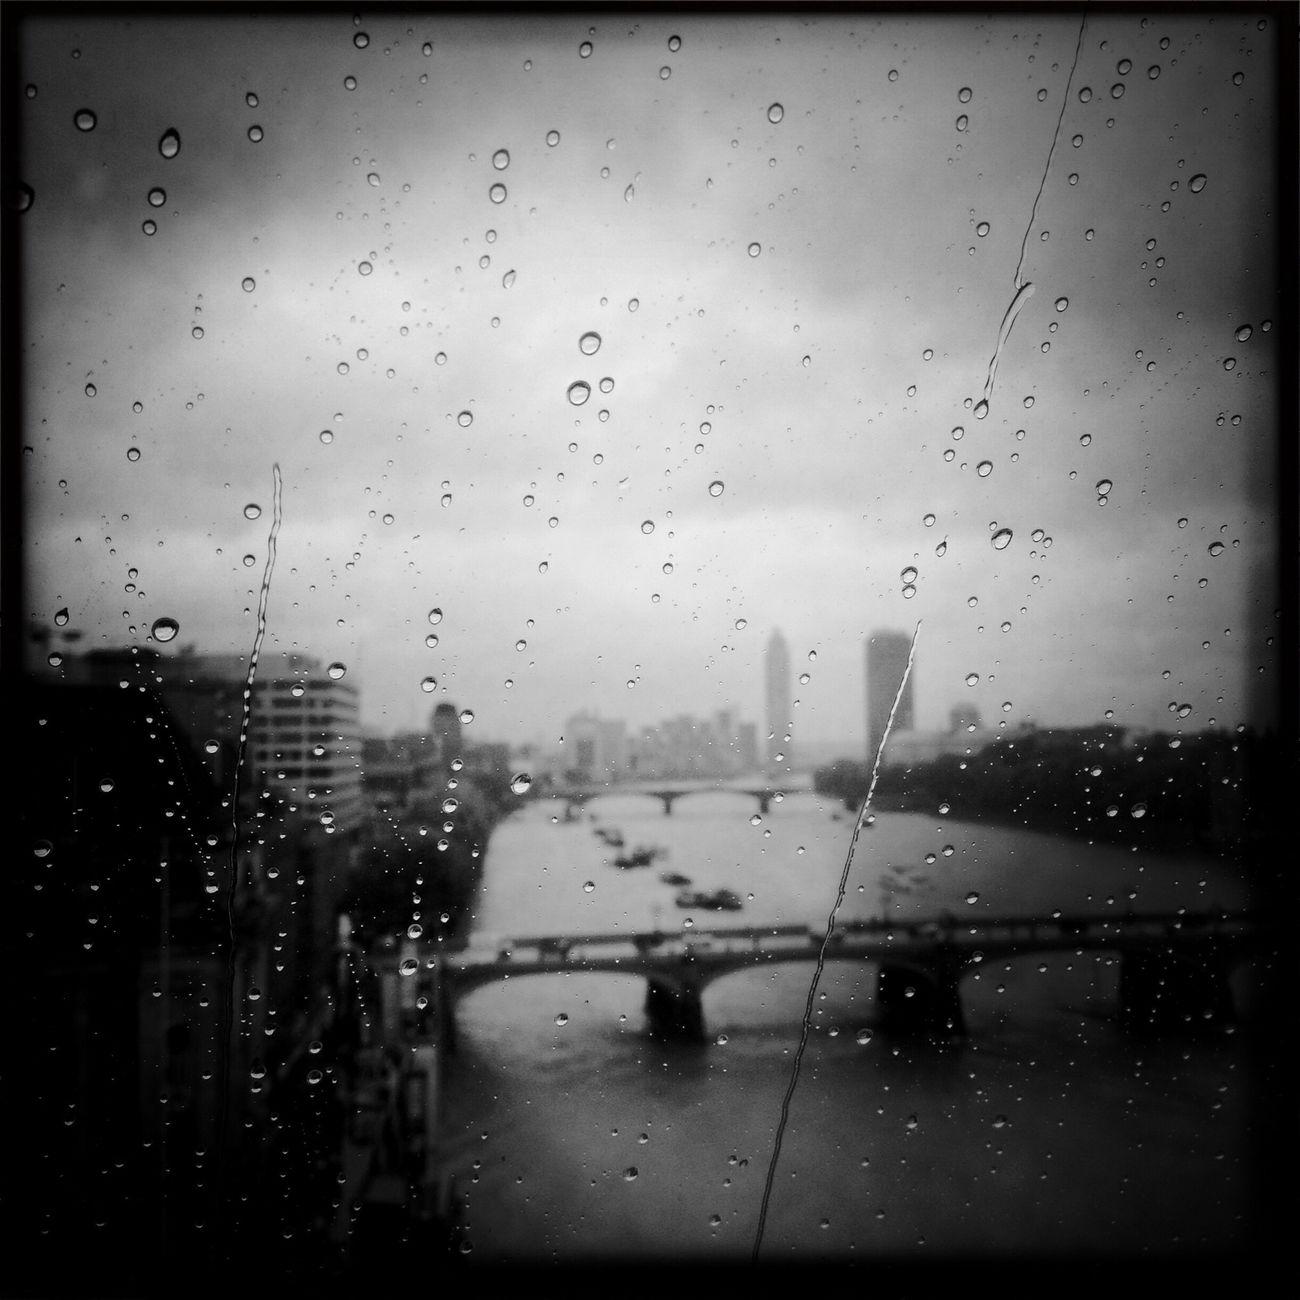 Saturated LondonEye Blackandwhite Hipstamatic London